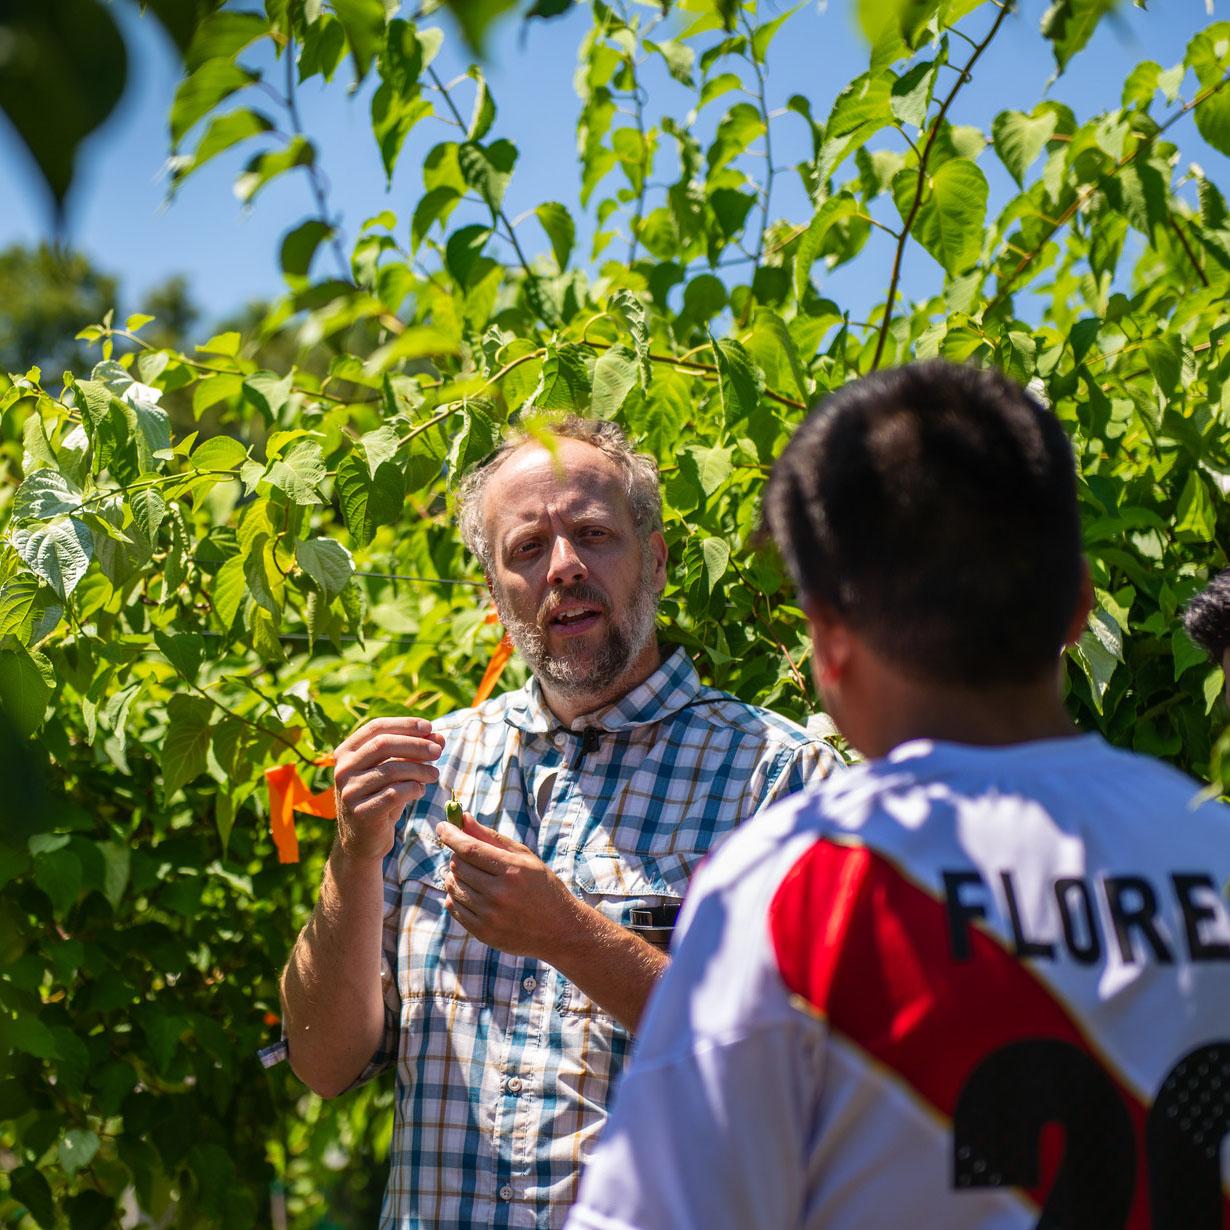 Dr. Iago Hale demonstrating kiwiberries